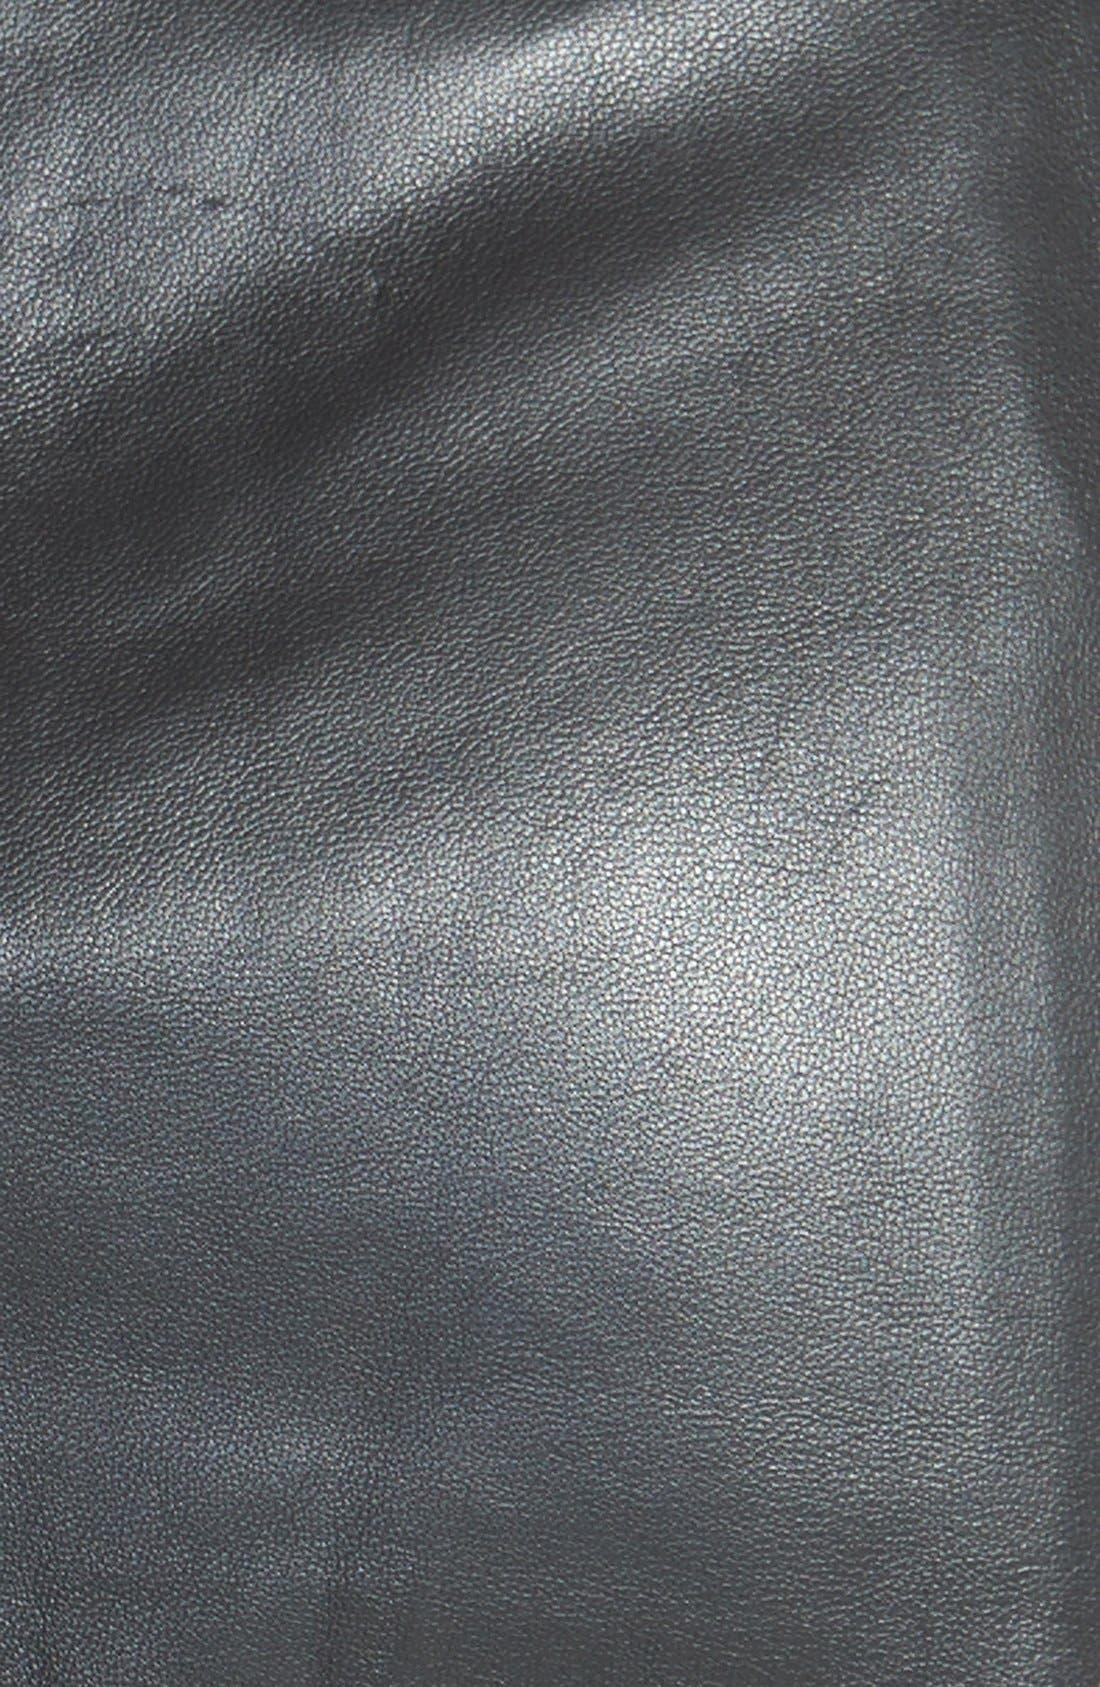 Alternate Image 3  - Halogen® Leather Panel Pencil Skirt (Online Only)